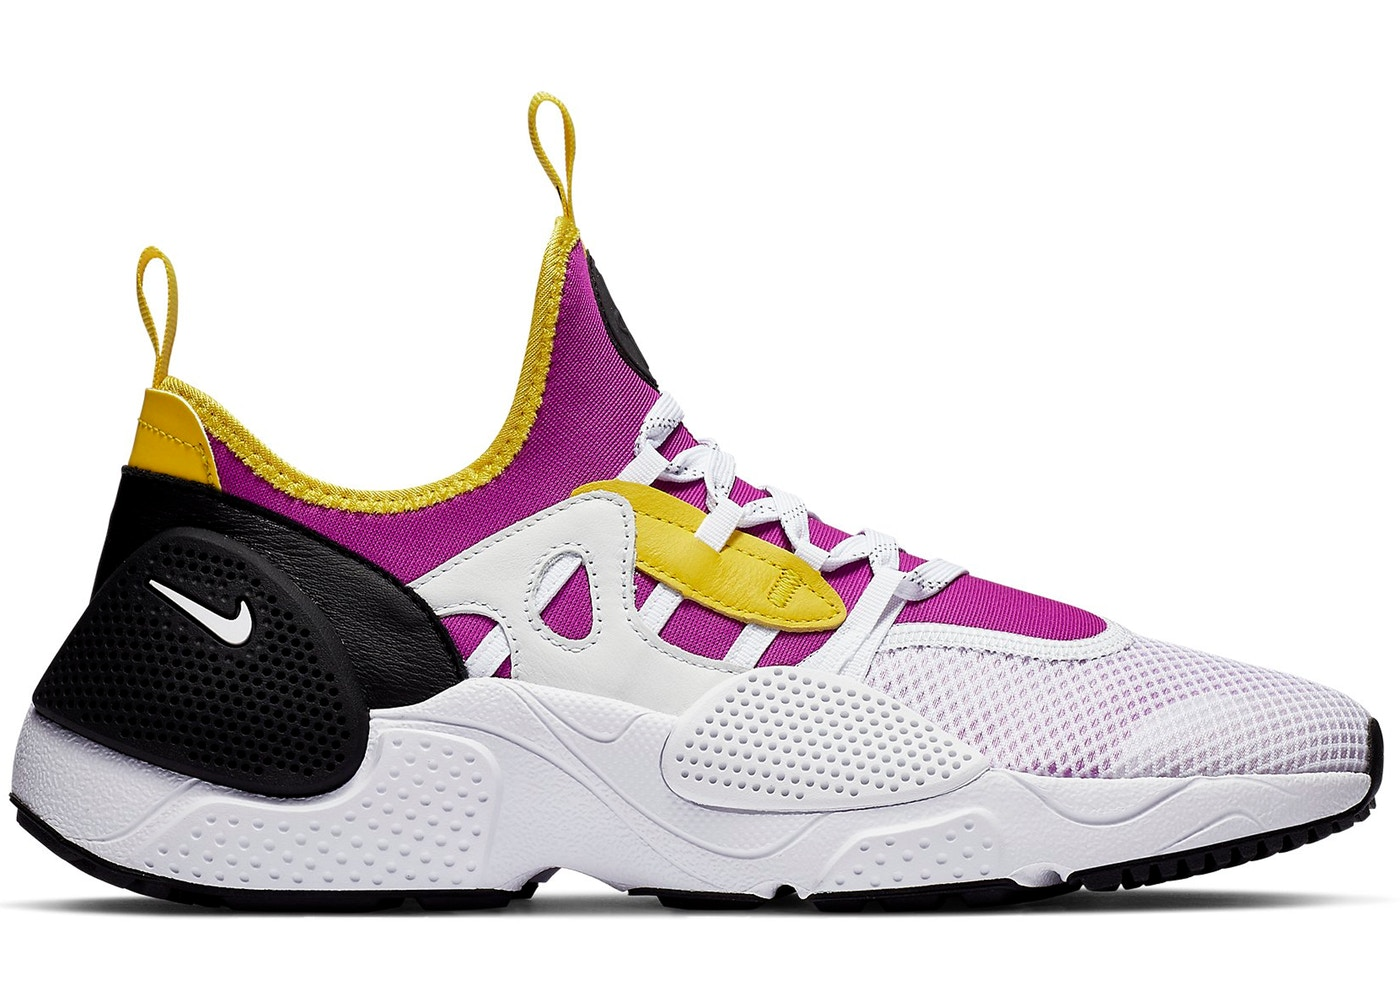 6e38546e8e76c Nike Huarache Edge Magenta Neon Yellow - BQ5206-500